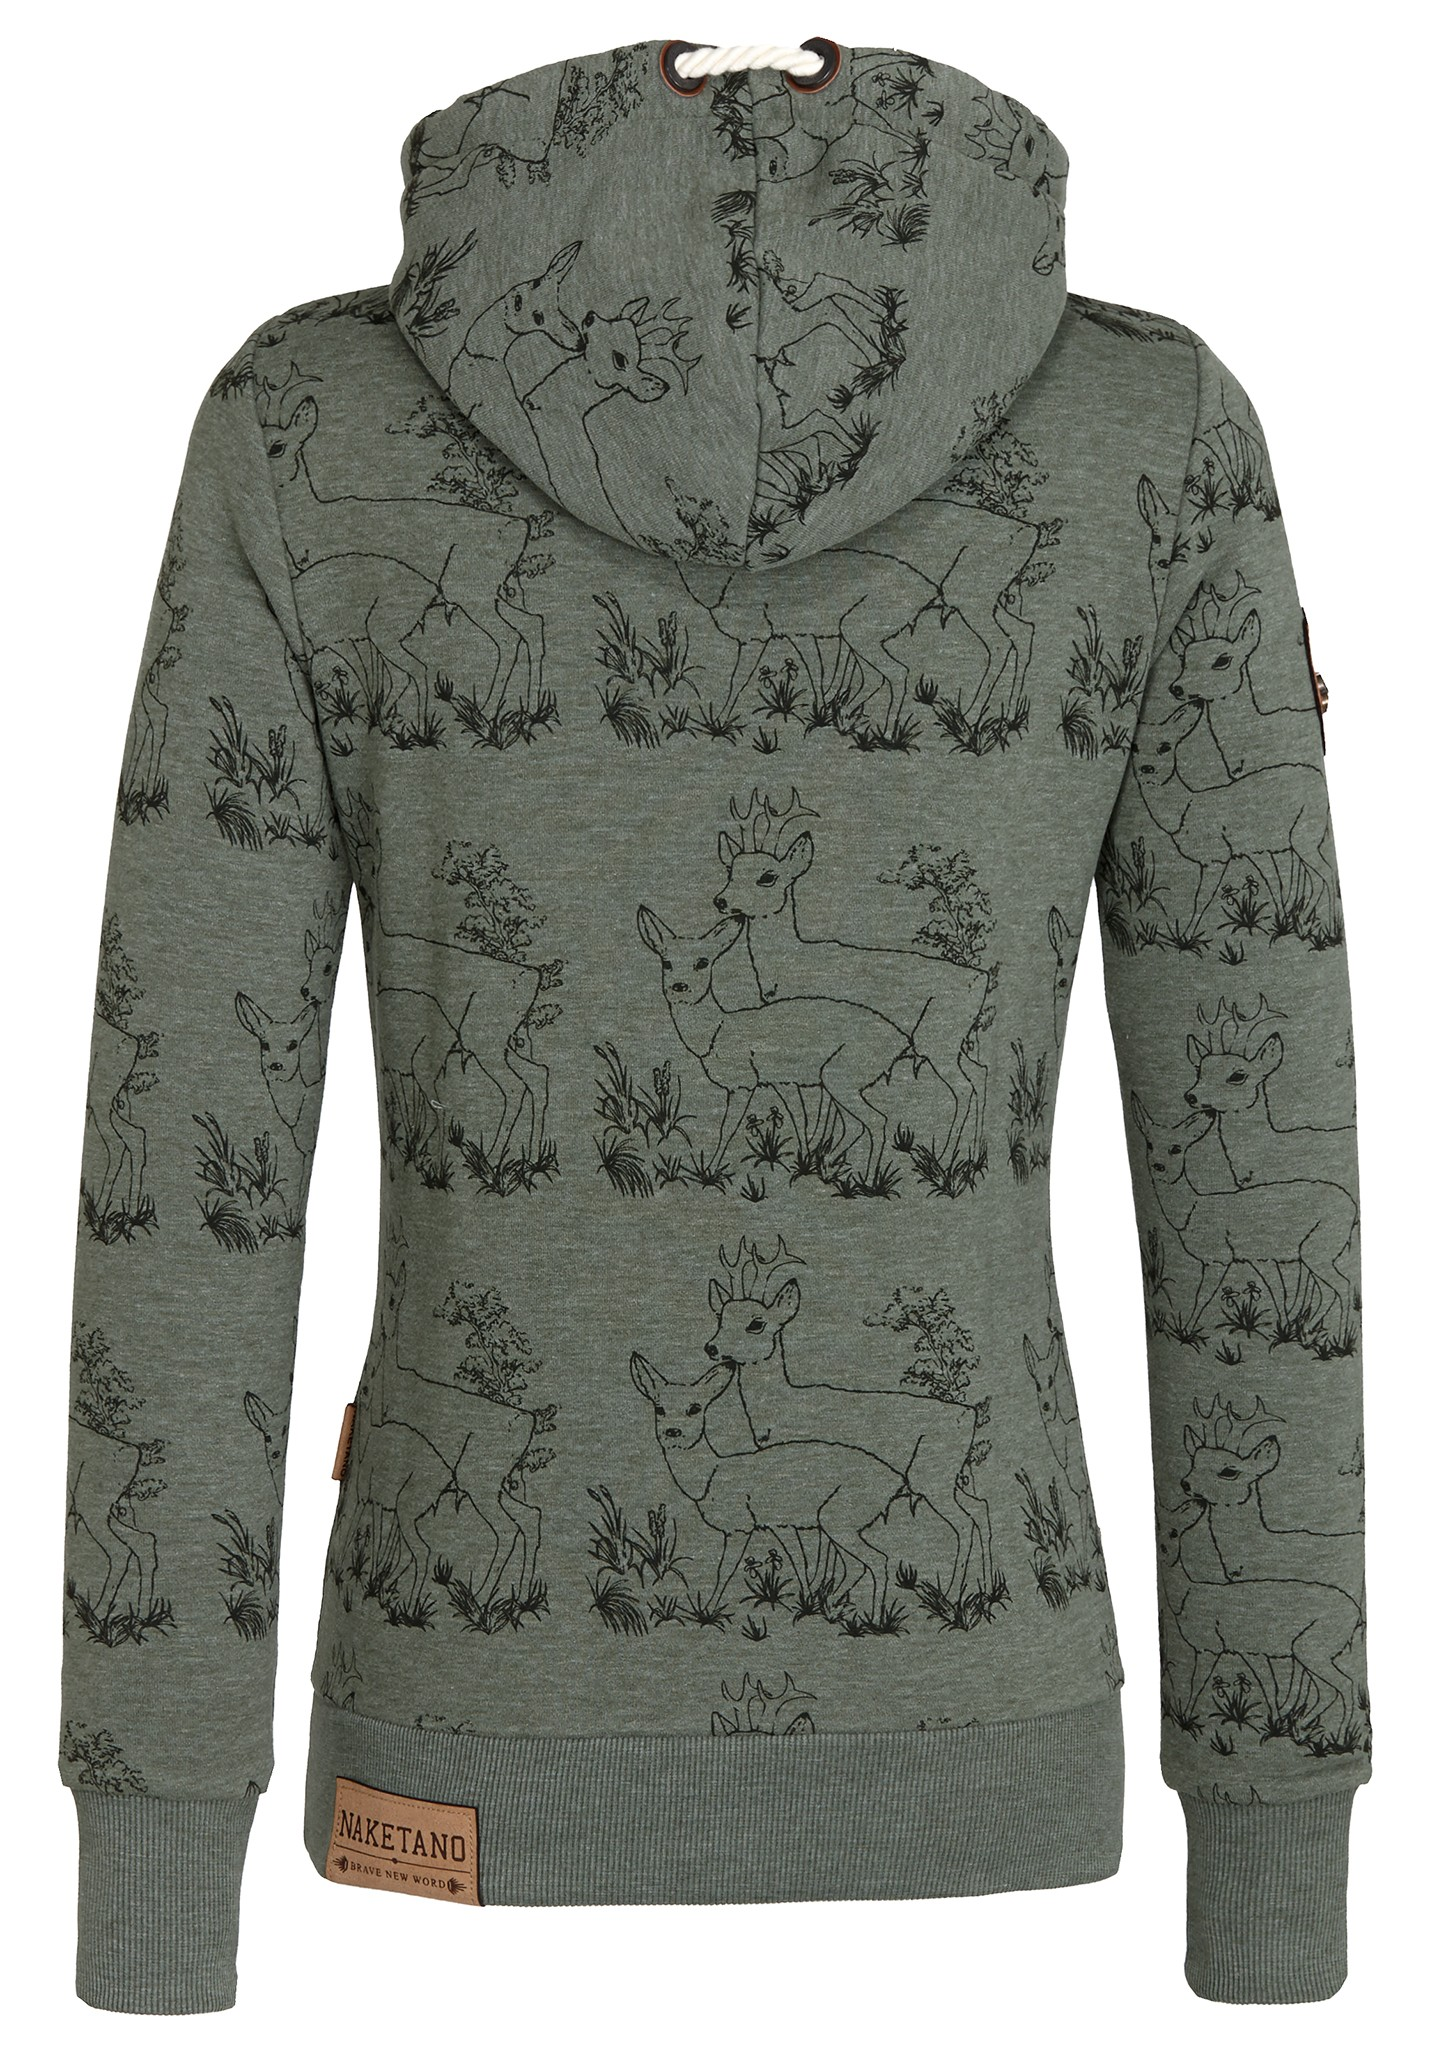 neu naketano darth im spessart iii damen kapuzenpullover pullover hoodie ebay. Black Bedroom Furniture Sets. Home Design Ideas